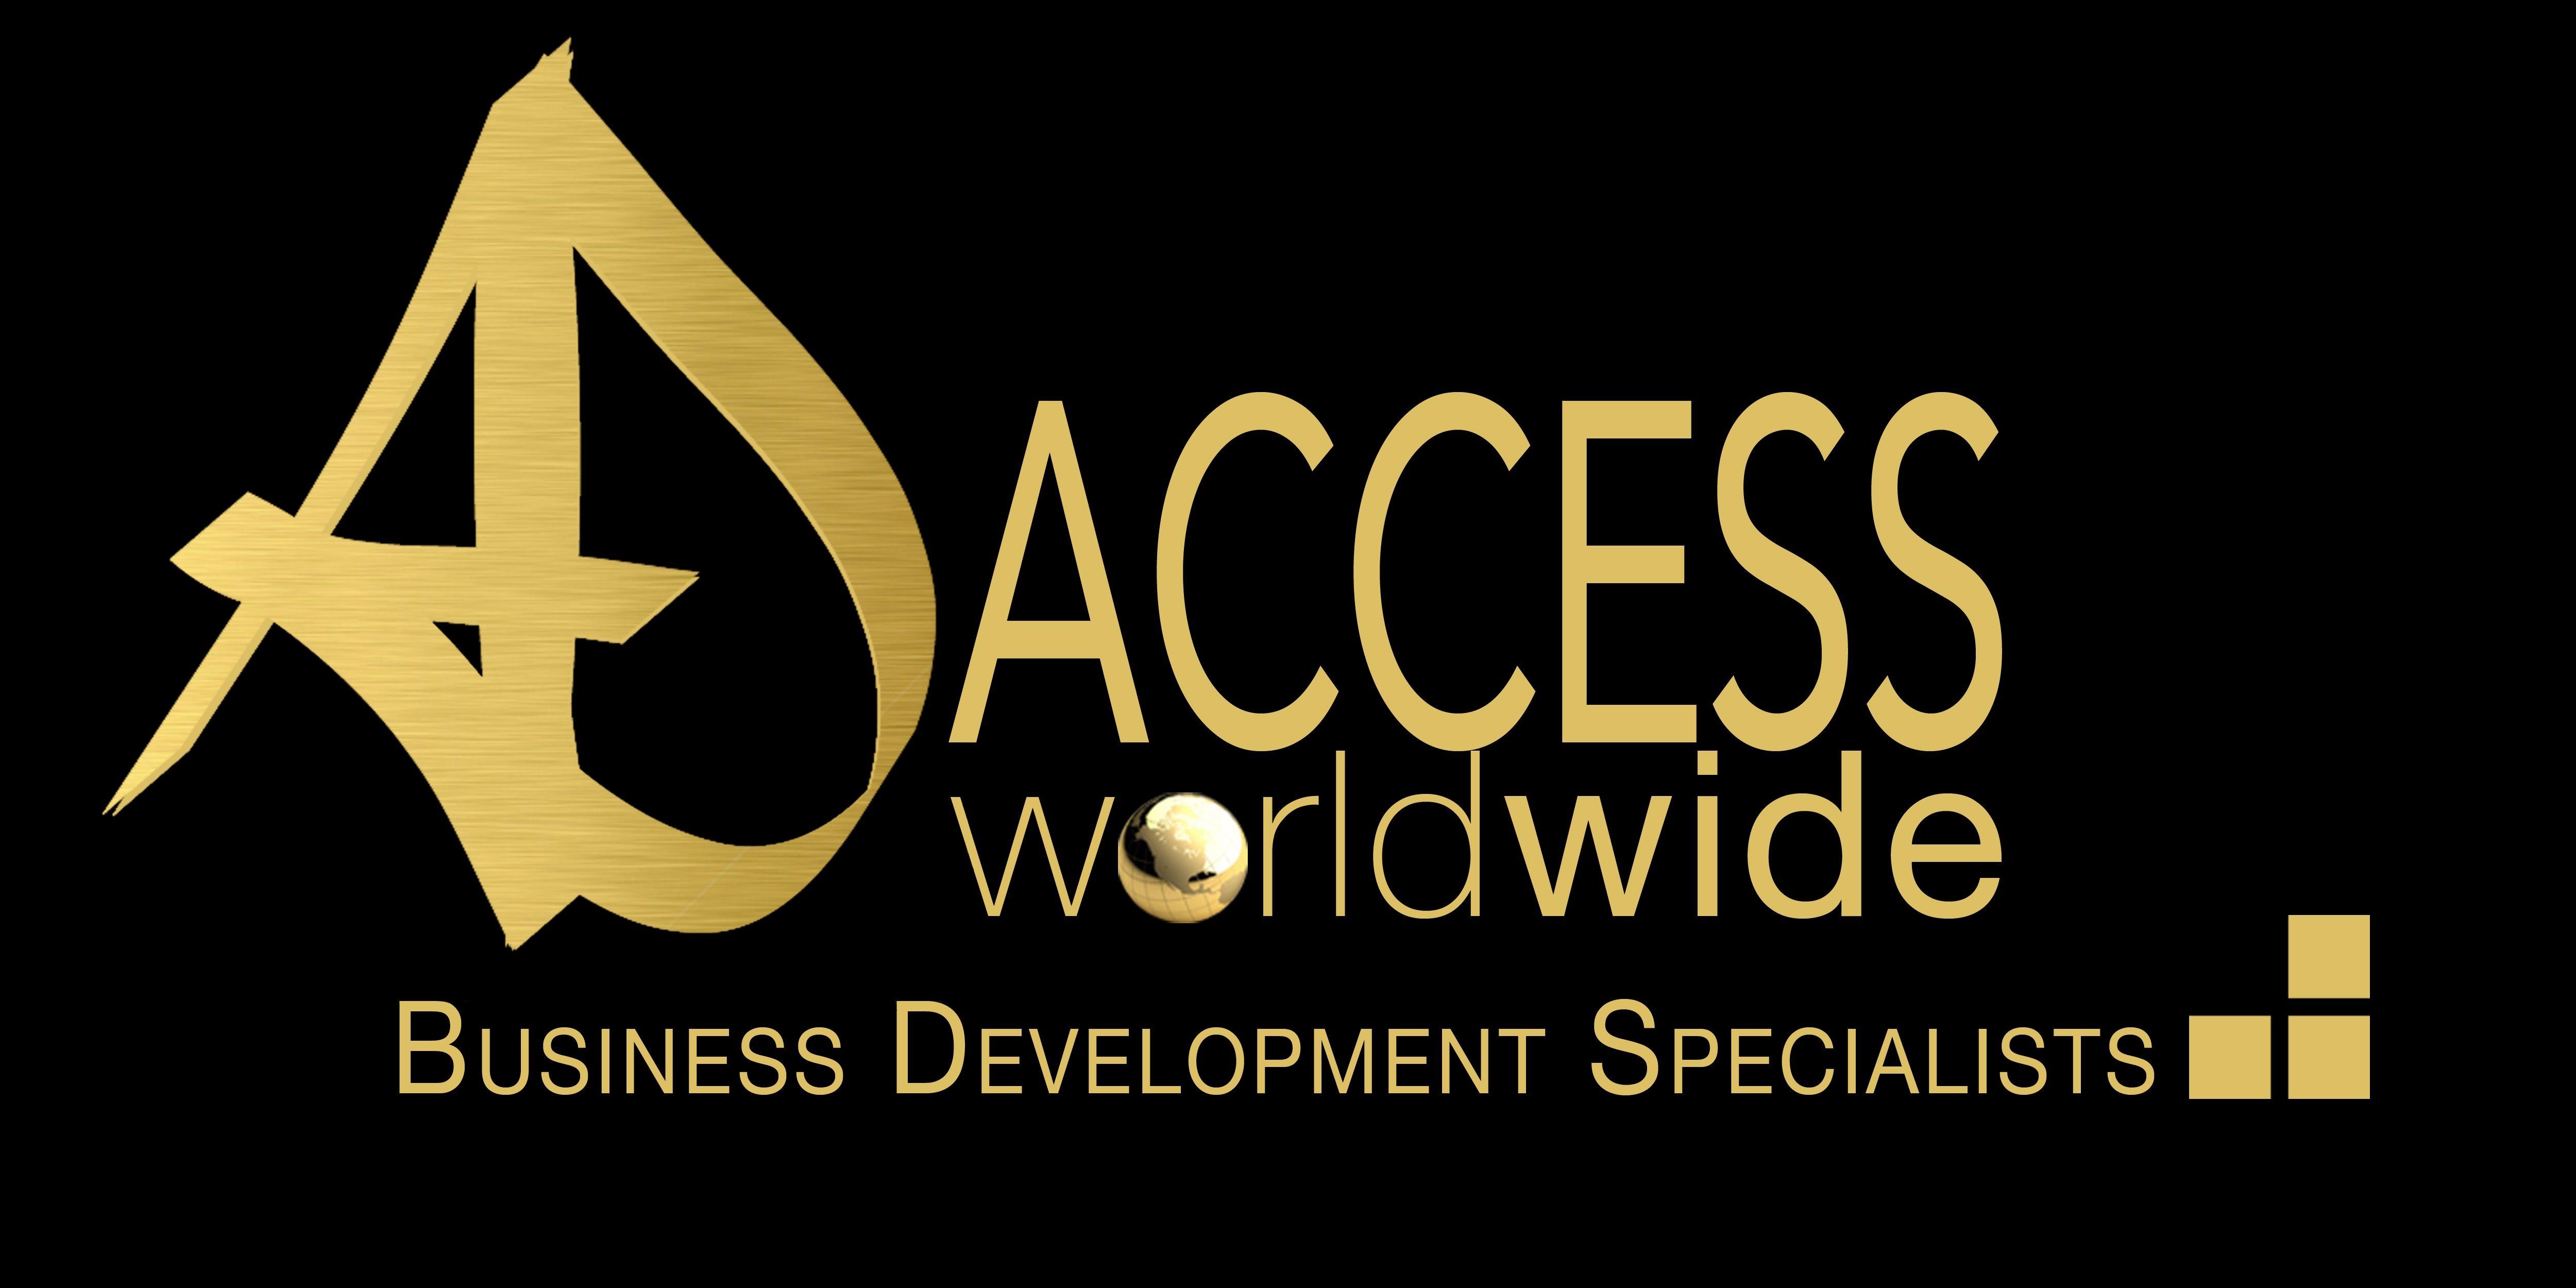 AD ACCESS WORLDWIDE